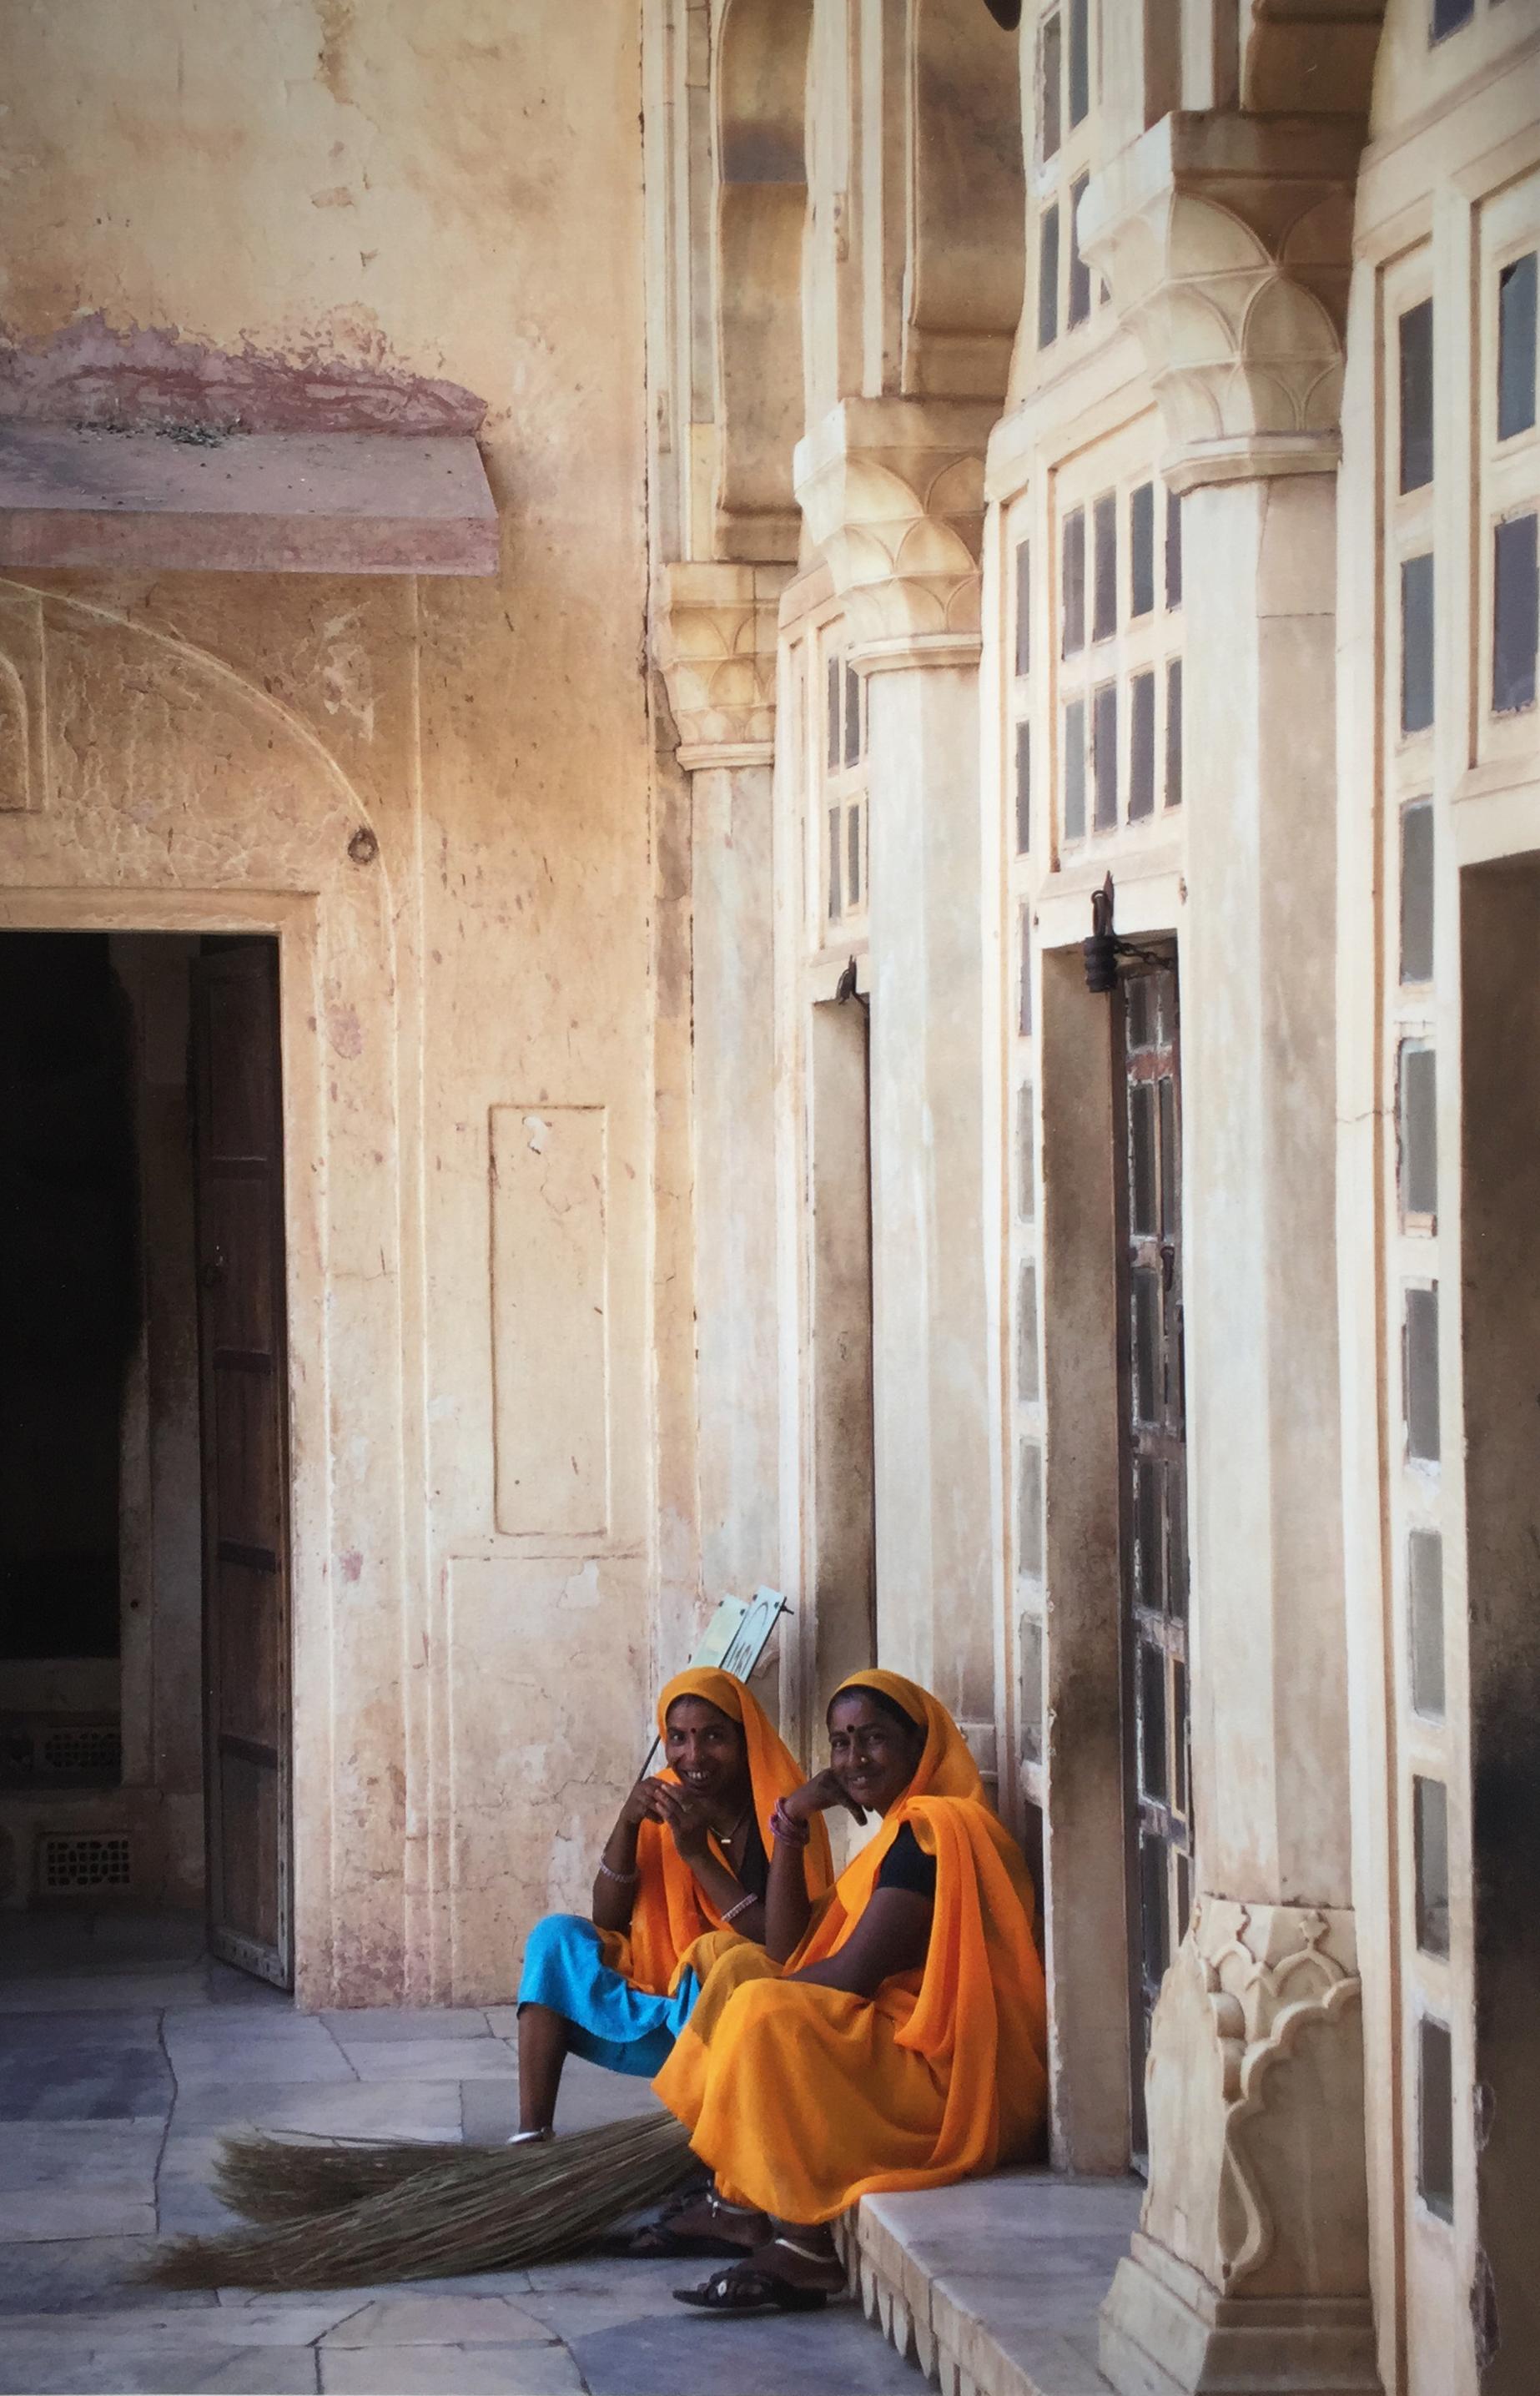 Agra, India | 2012